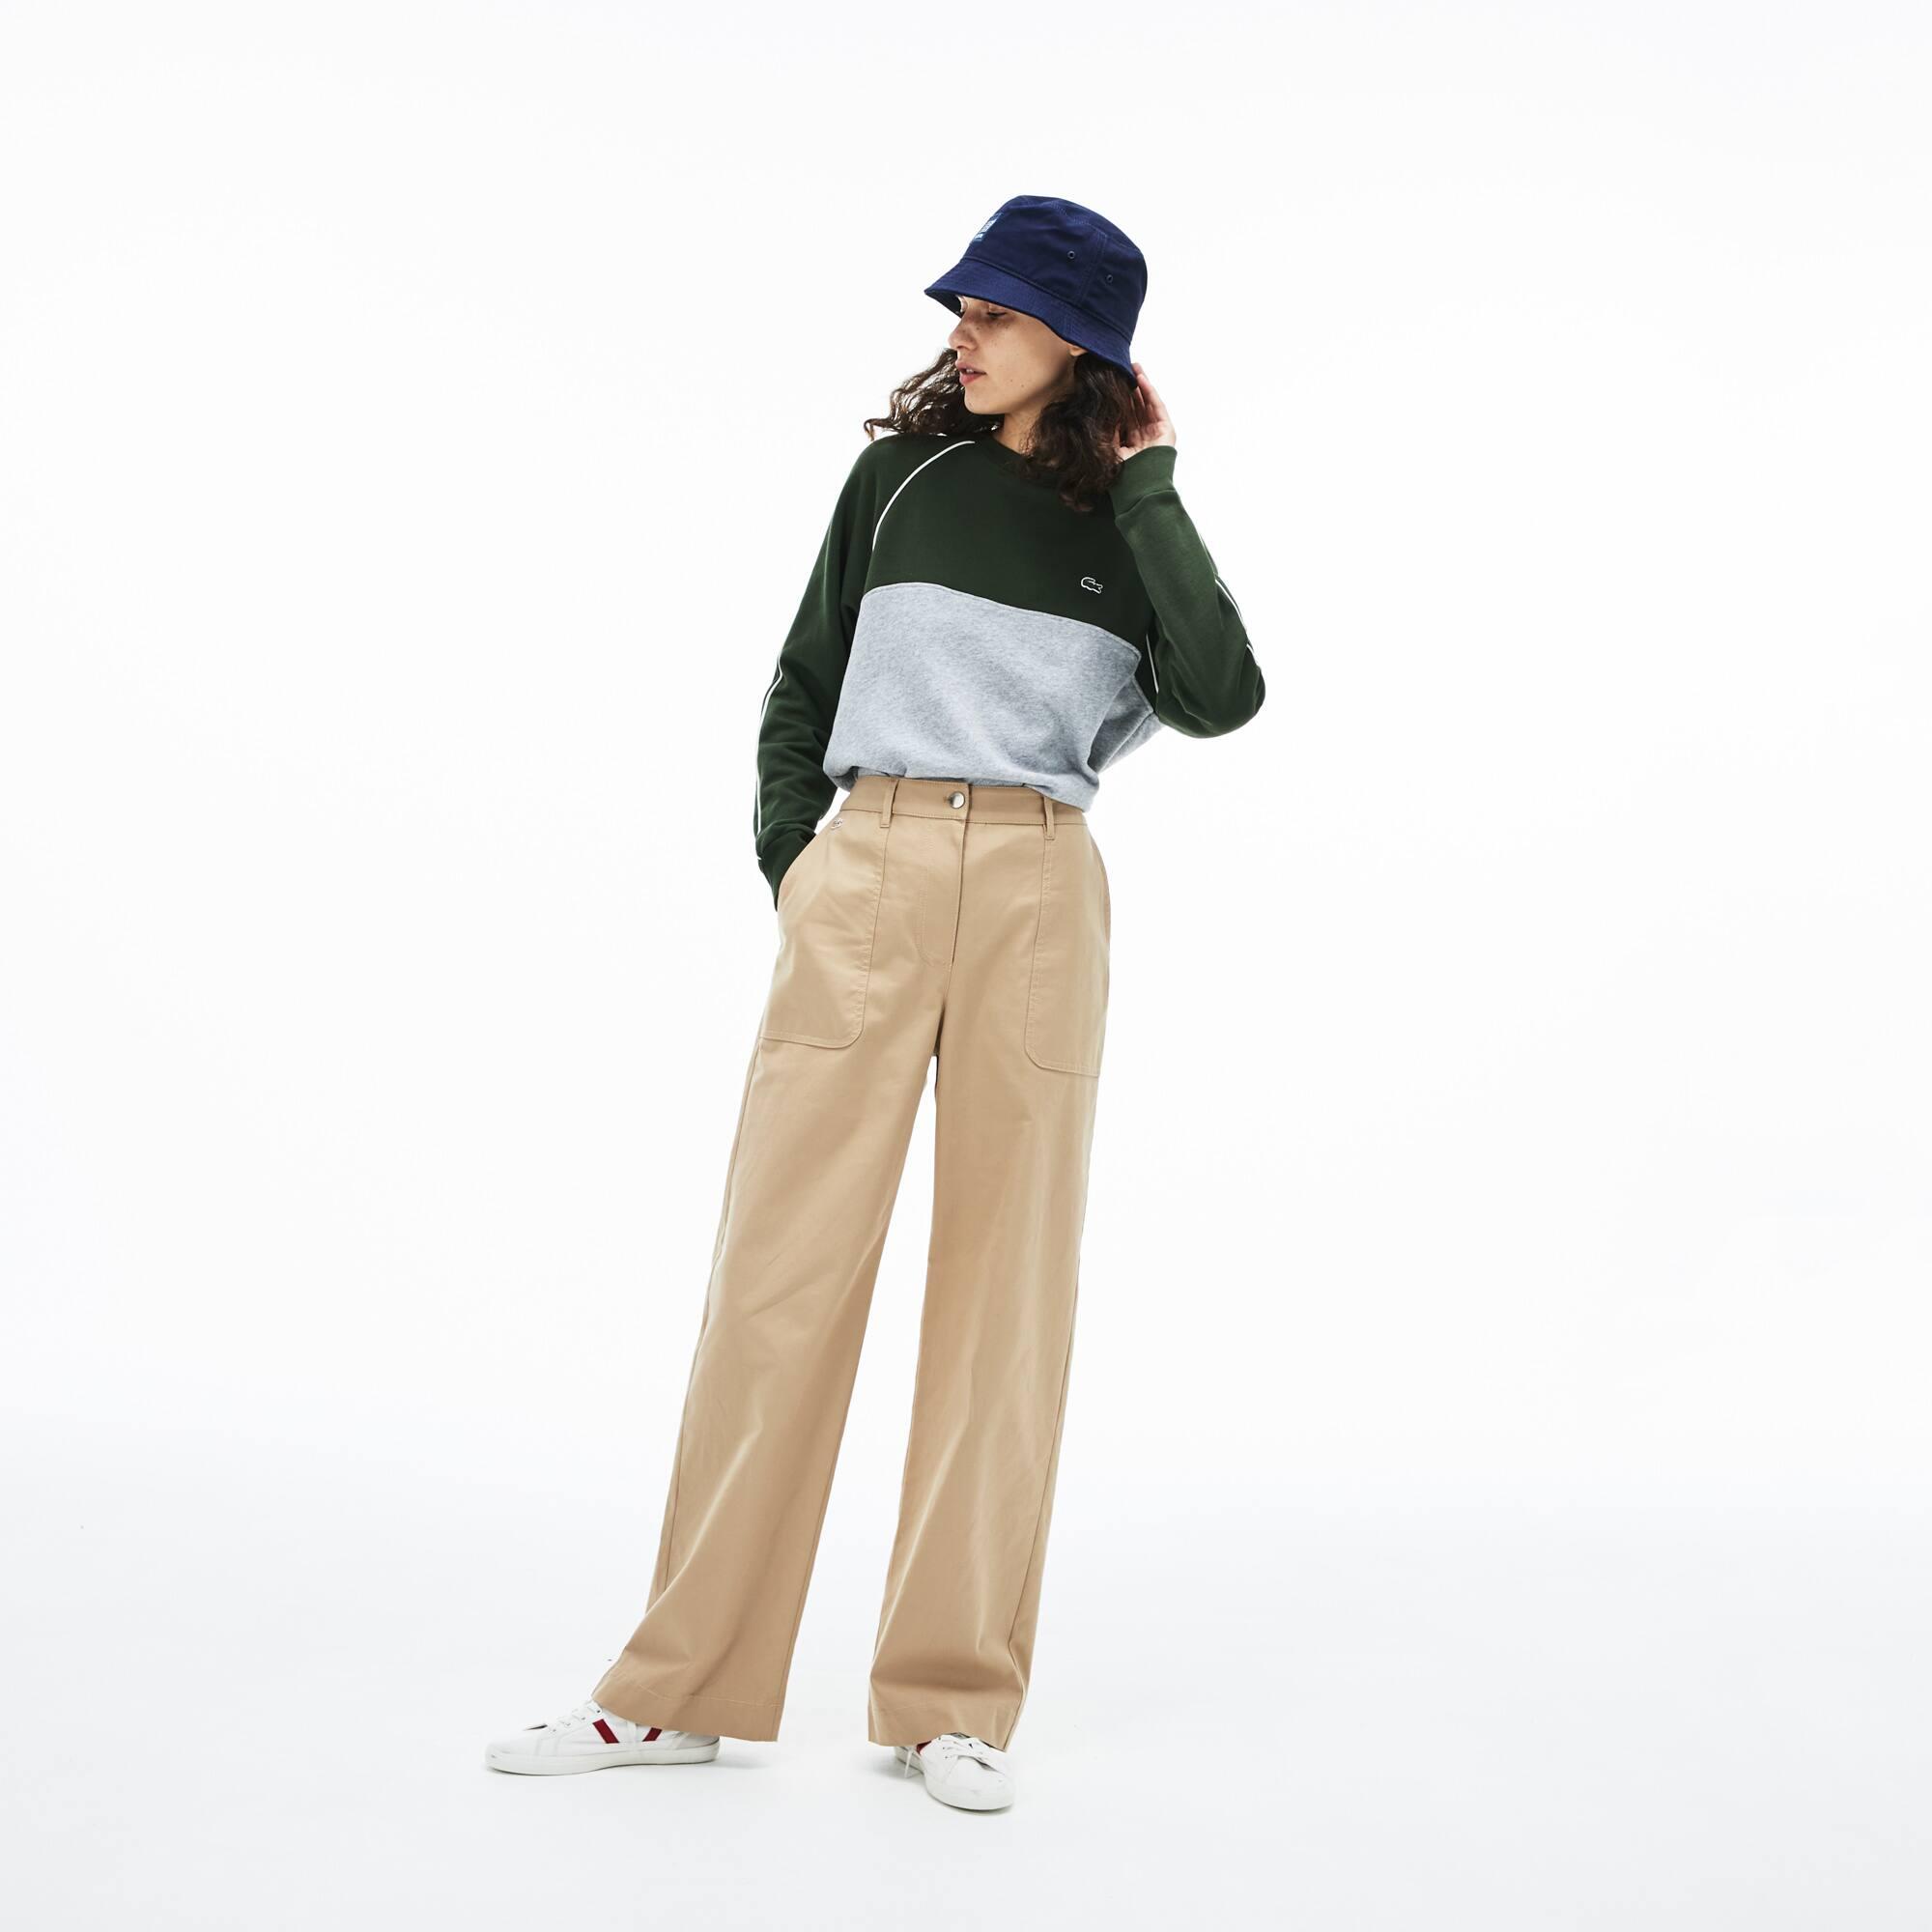 Joggingbroek Dames Katoen.Trousers And Shorts Women S Fashion Lacoste